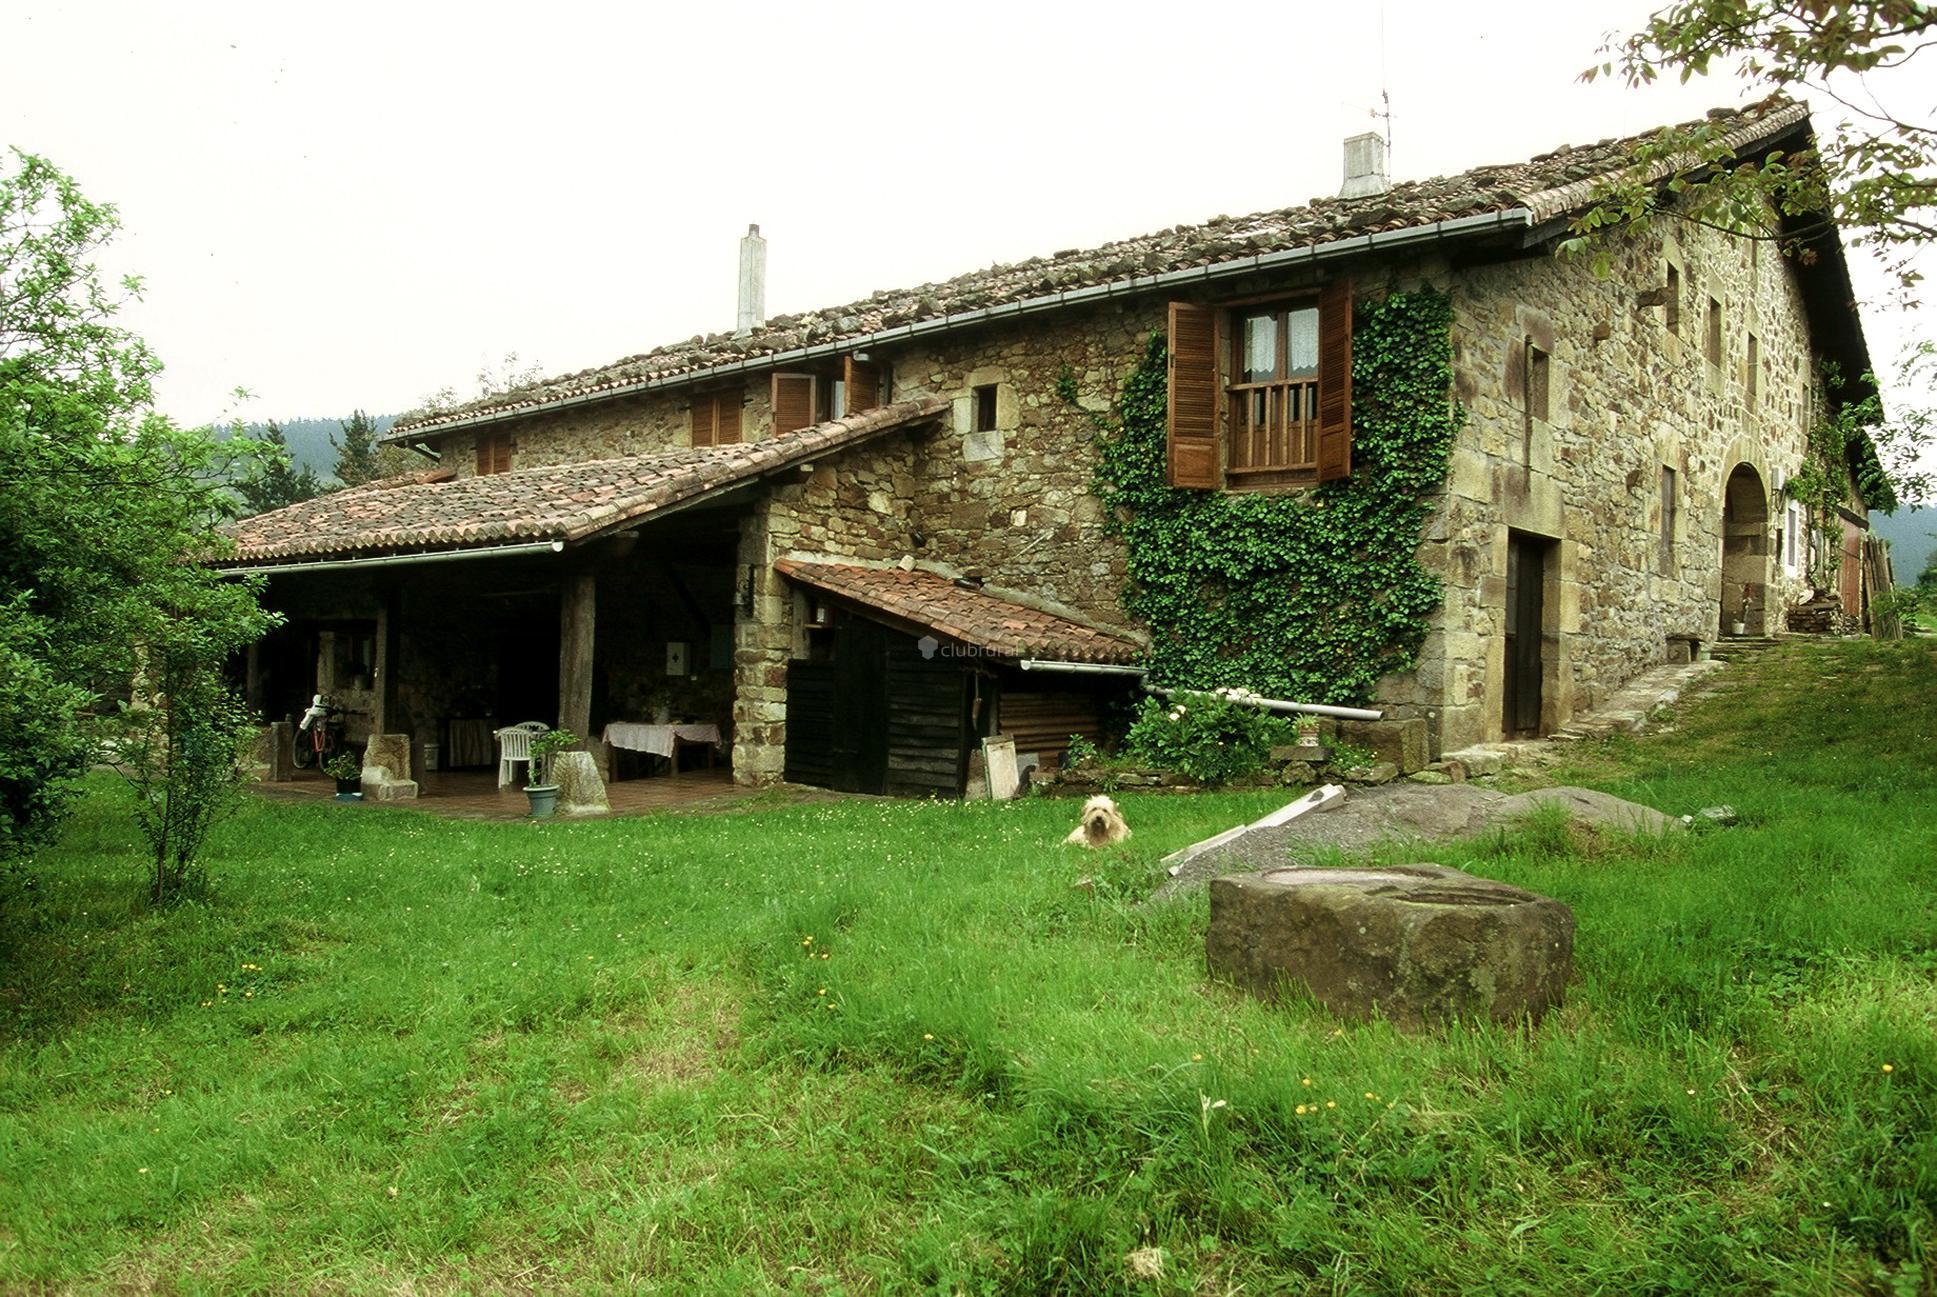 Fotos de imitte etxebarria vizcaya atxondo clubrural - Casas rurales pais vasco alquiler integro ...